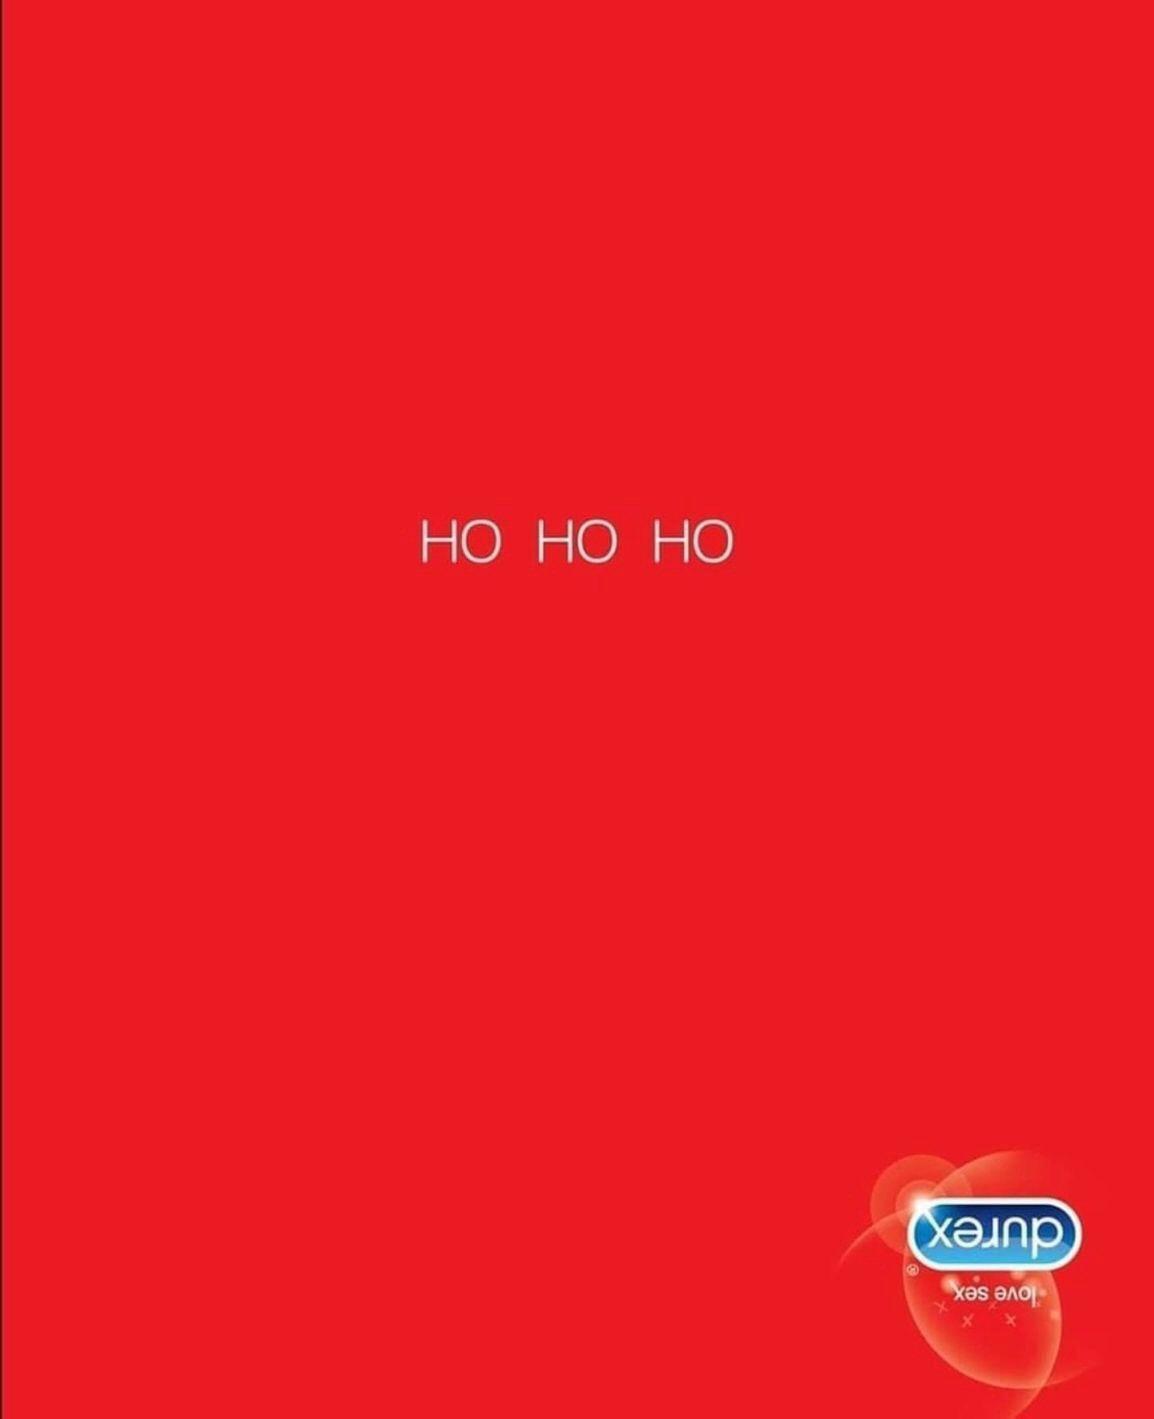 Durex: Ho Ho Ho inverted